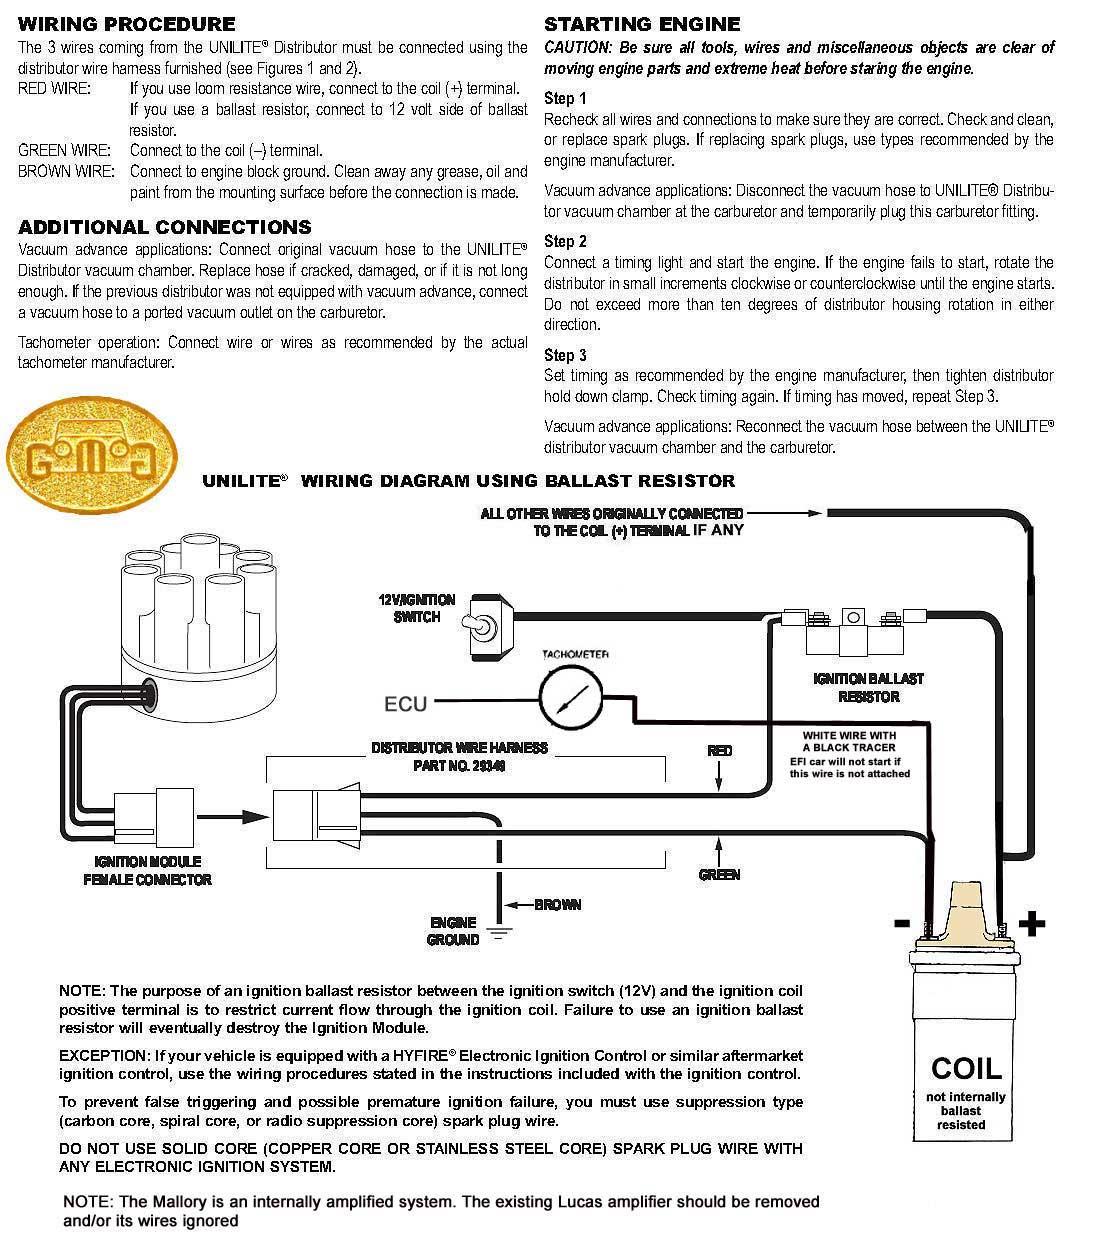 holden colorado trailer wiring diagram printable sets of numbers v8 distributor free download